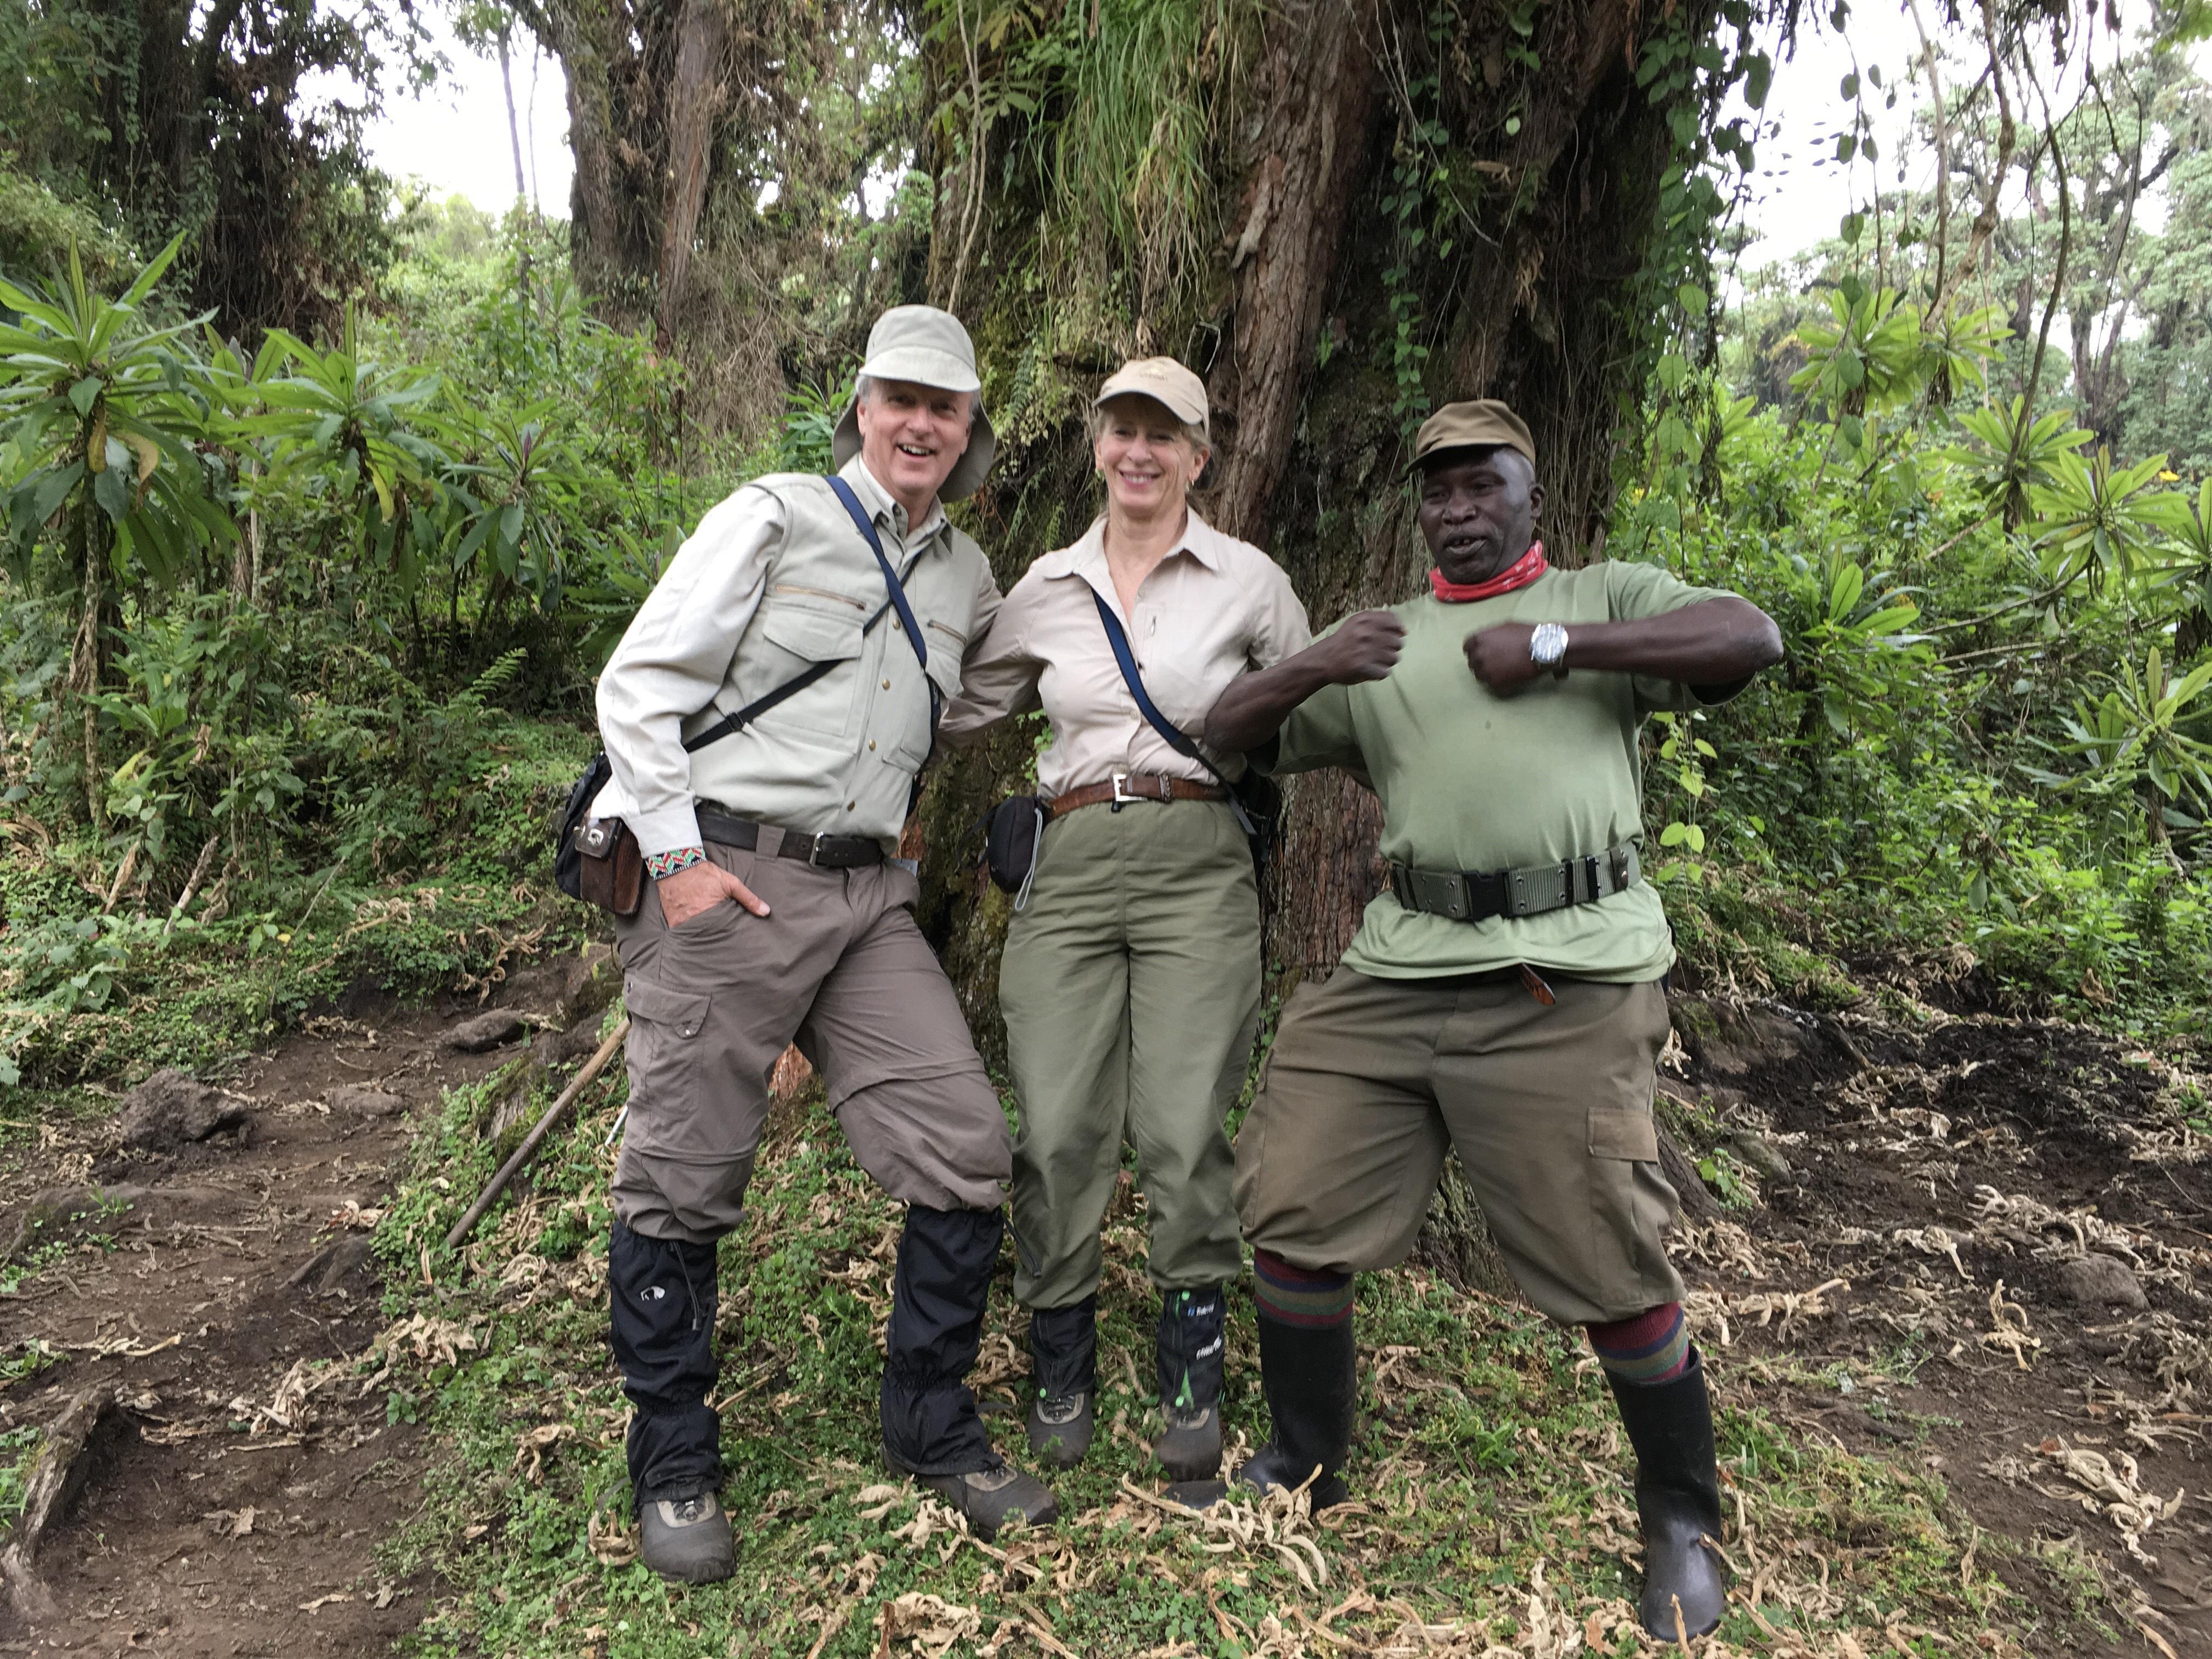 Brian Keating Dee Keating 2 Dian Fossey's camp in Rwanda